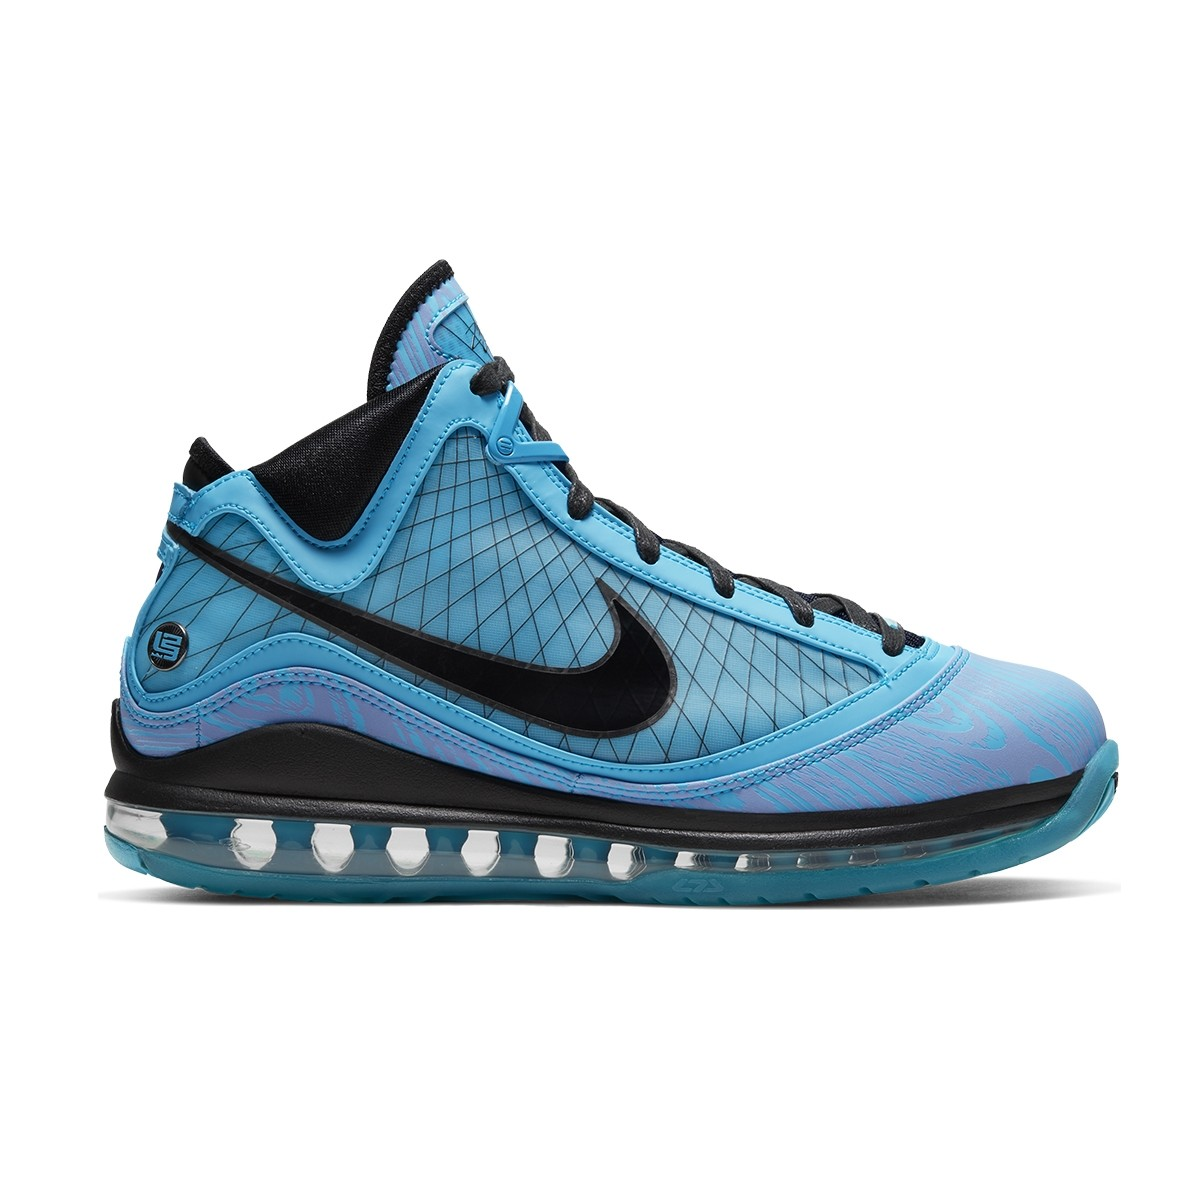 Nike Lebron 7 QS Jr 'All Star'